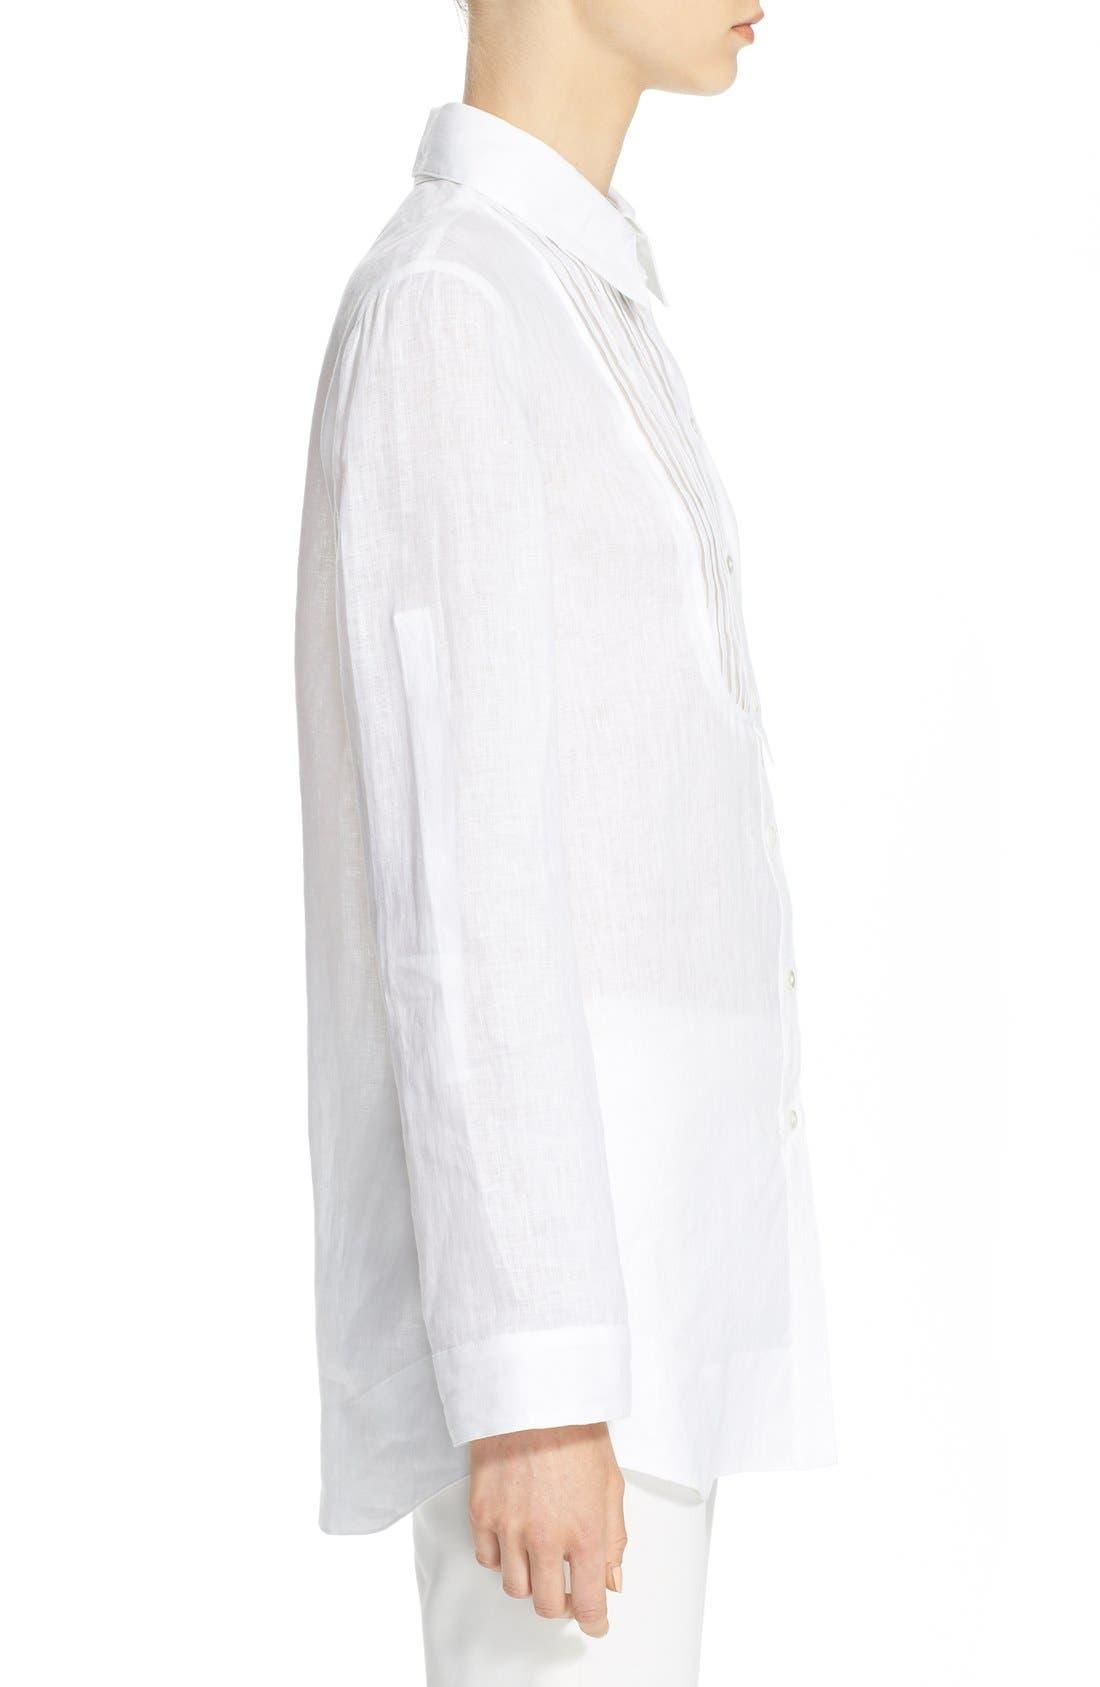 ARMANI COLLEZIONI,                             Linen Tuxedo Shirt,                             Alternate thumbnail 4, color,                             100